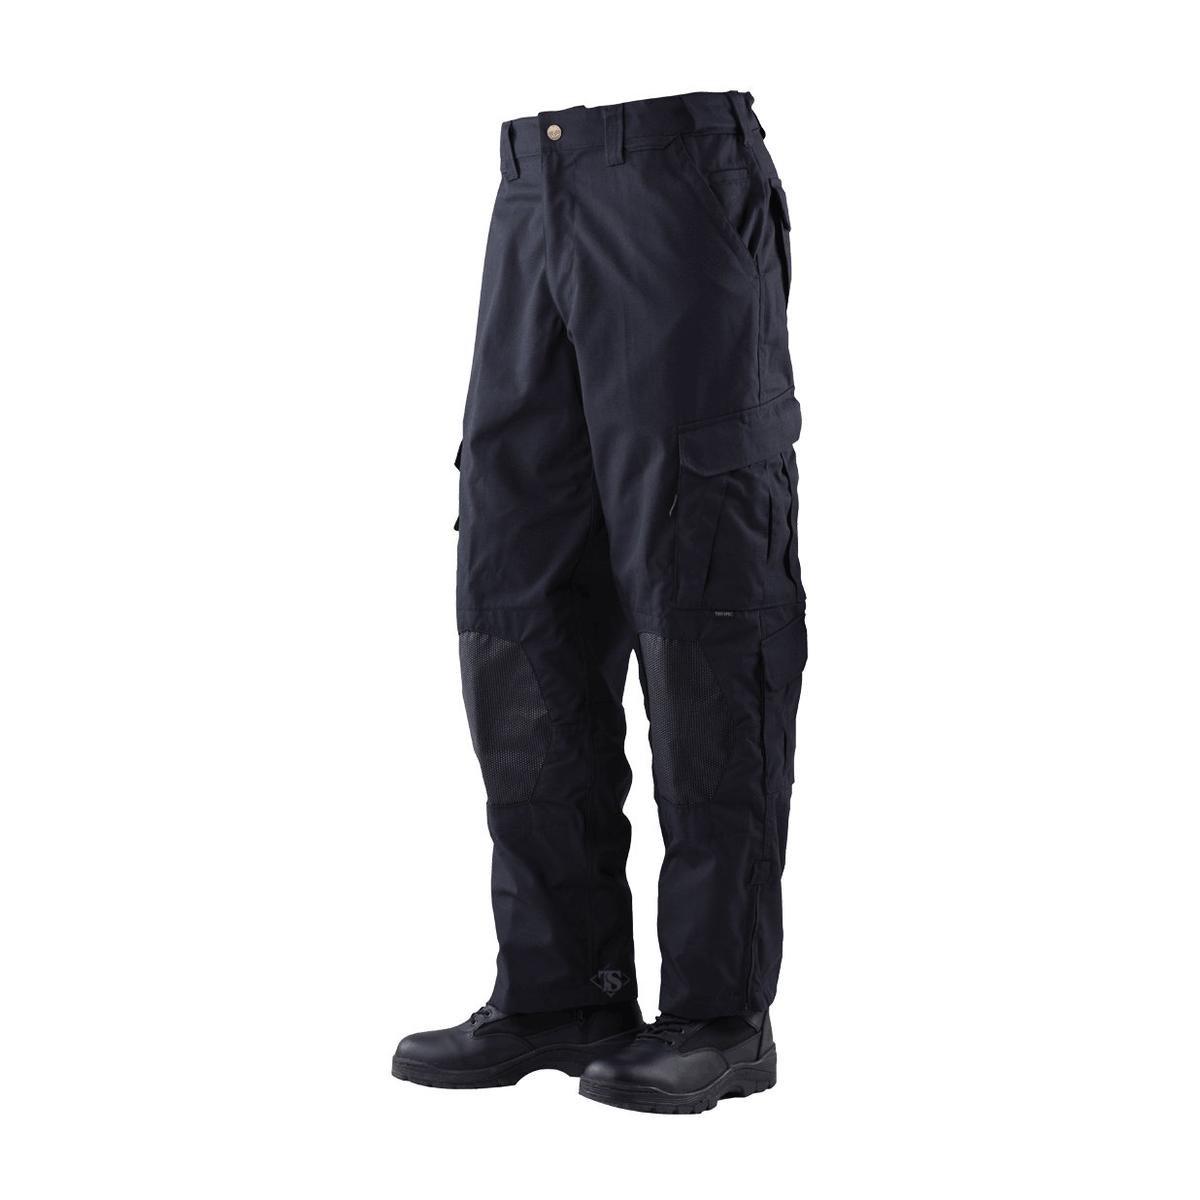 Black NYCO Rip-Stop Tru-Spec 1246 Mens TRU Xtreme Pants